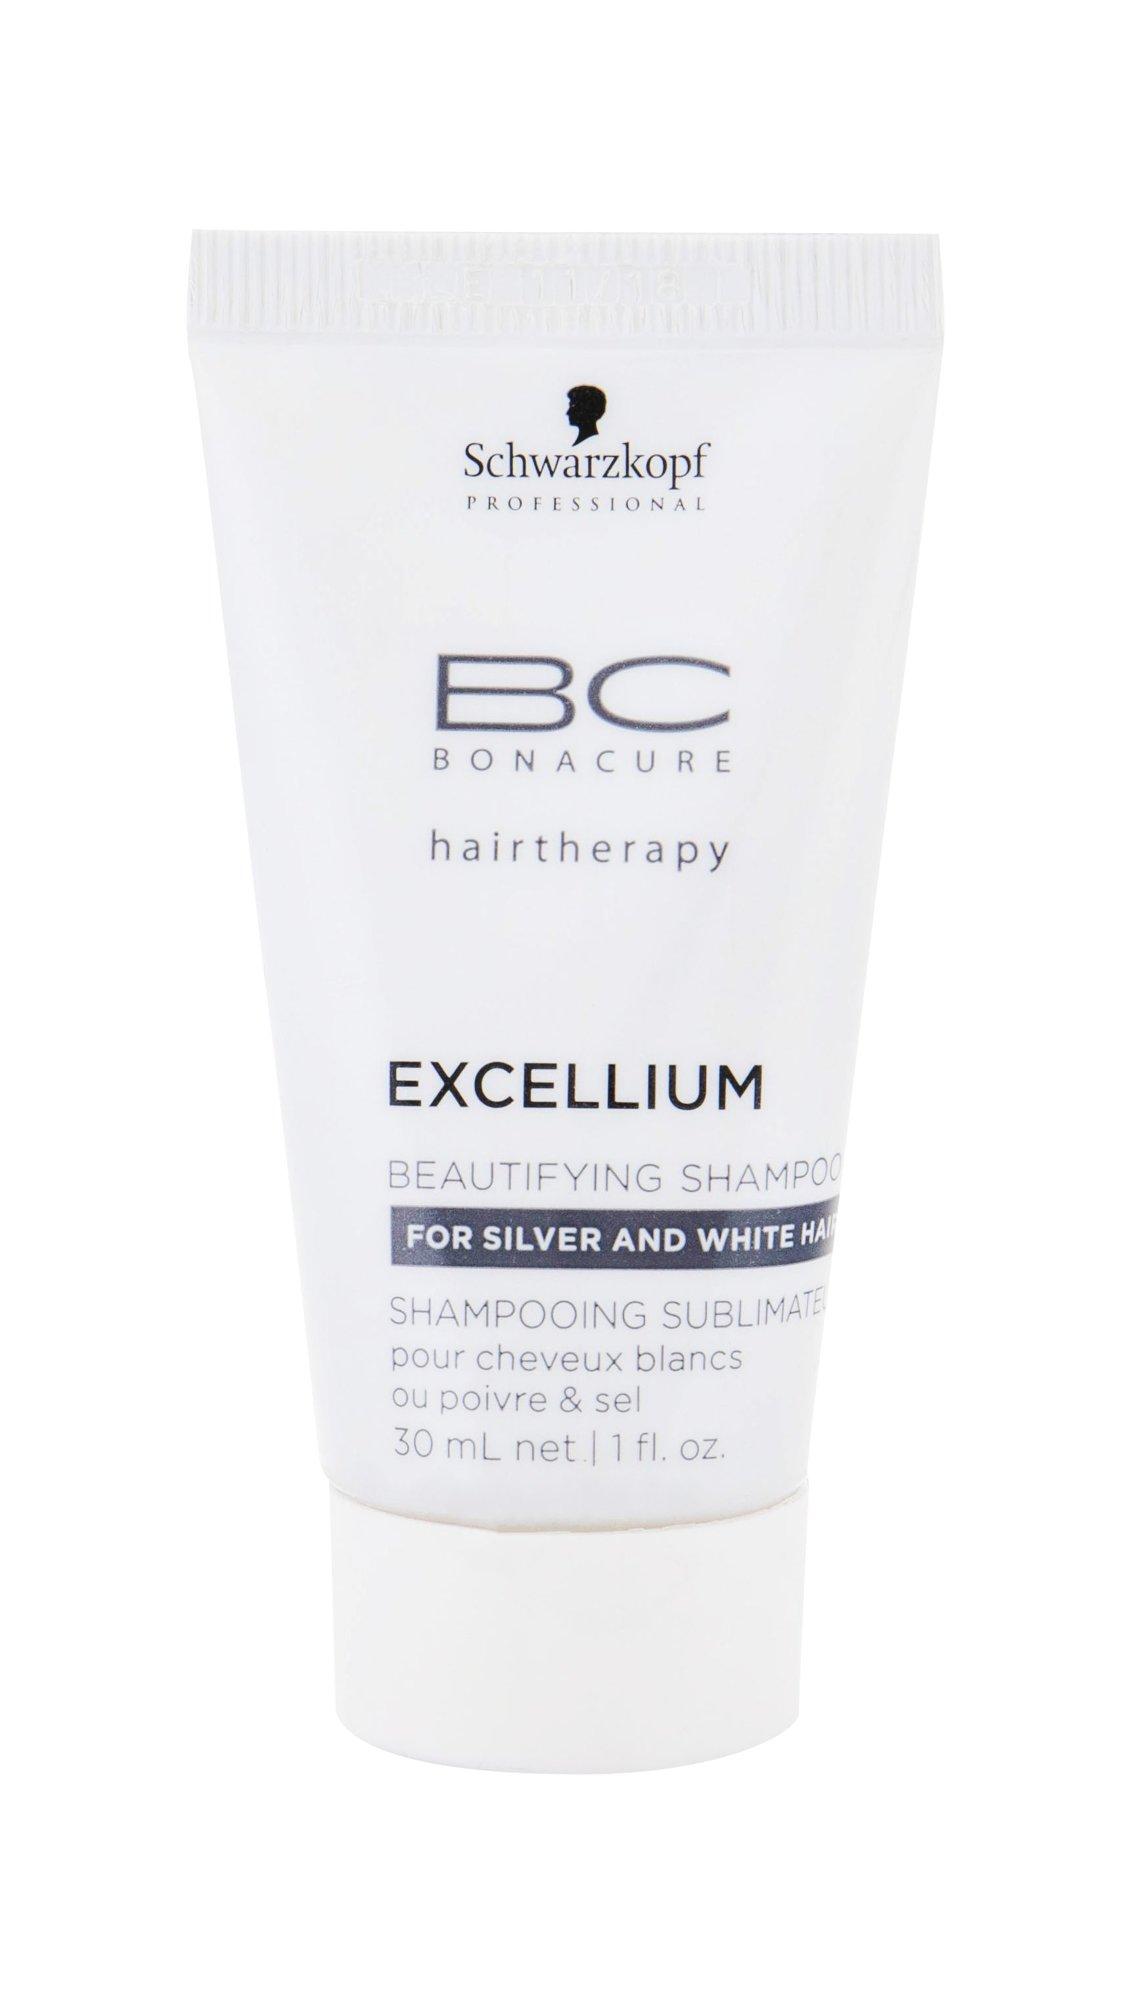 Schwarzkopf BC Bonacure Excellium Shampoo 30ml